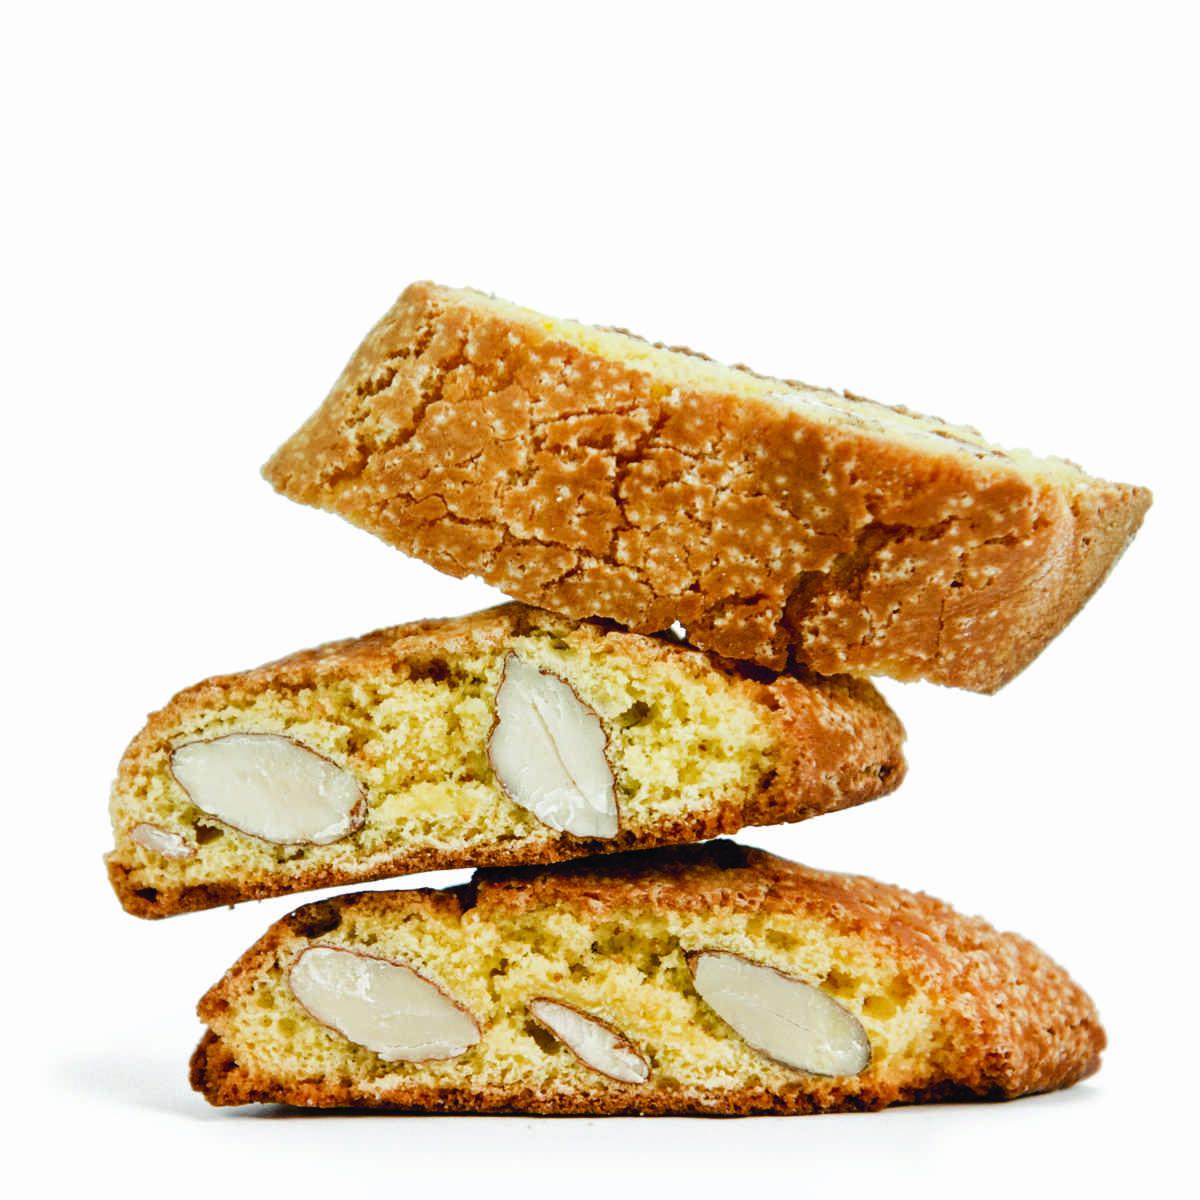 biscotti-prato-antonio-mattei-biscuits